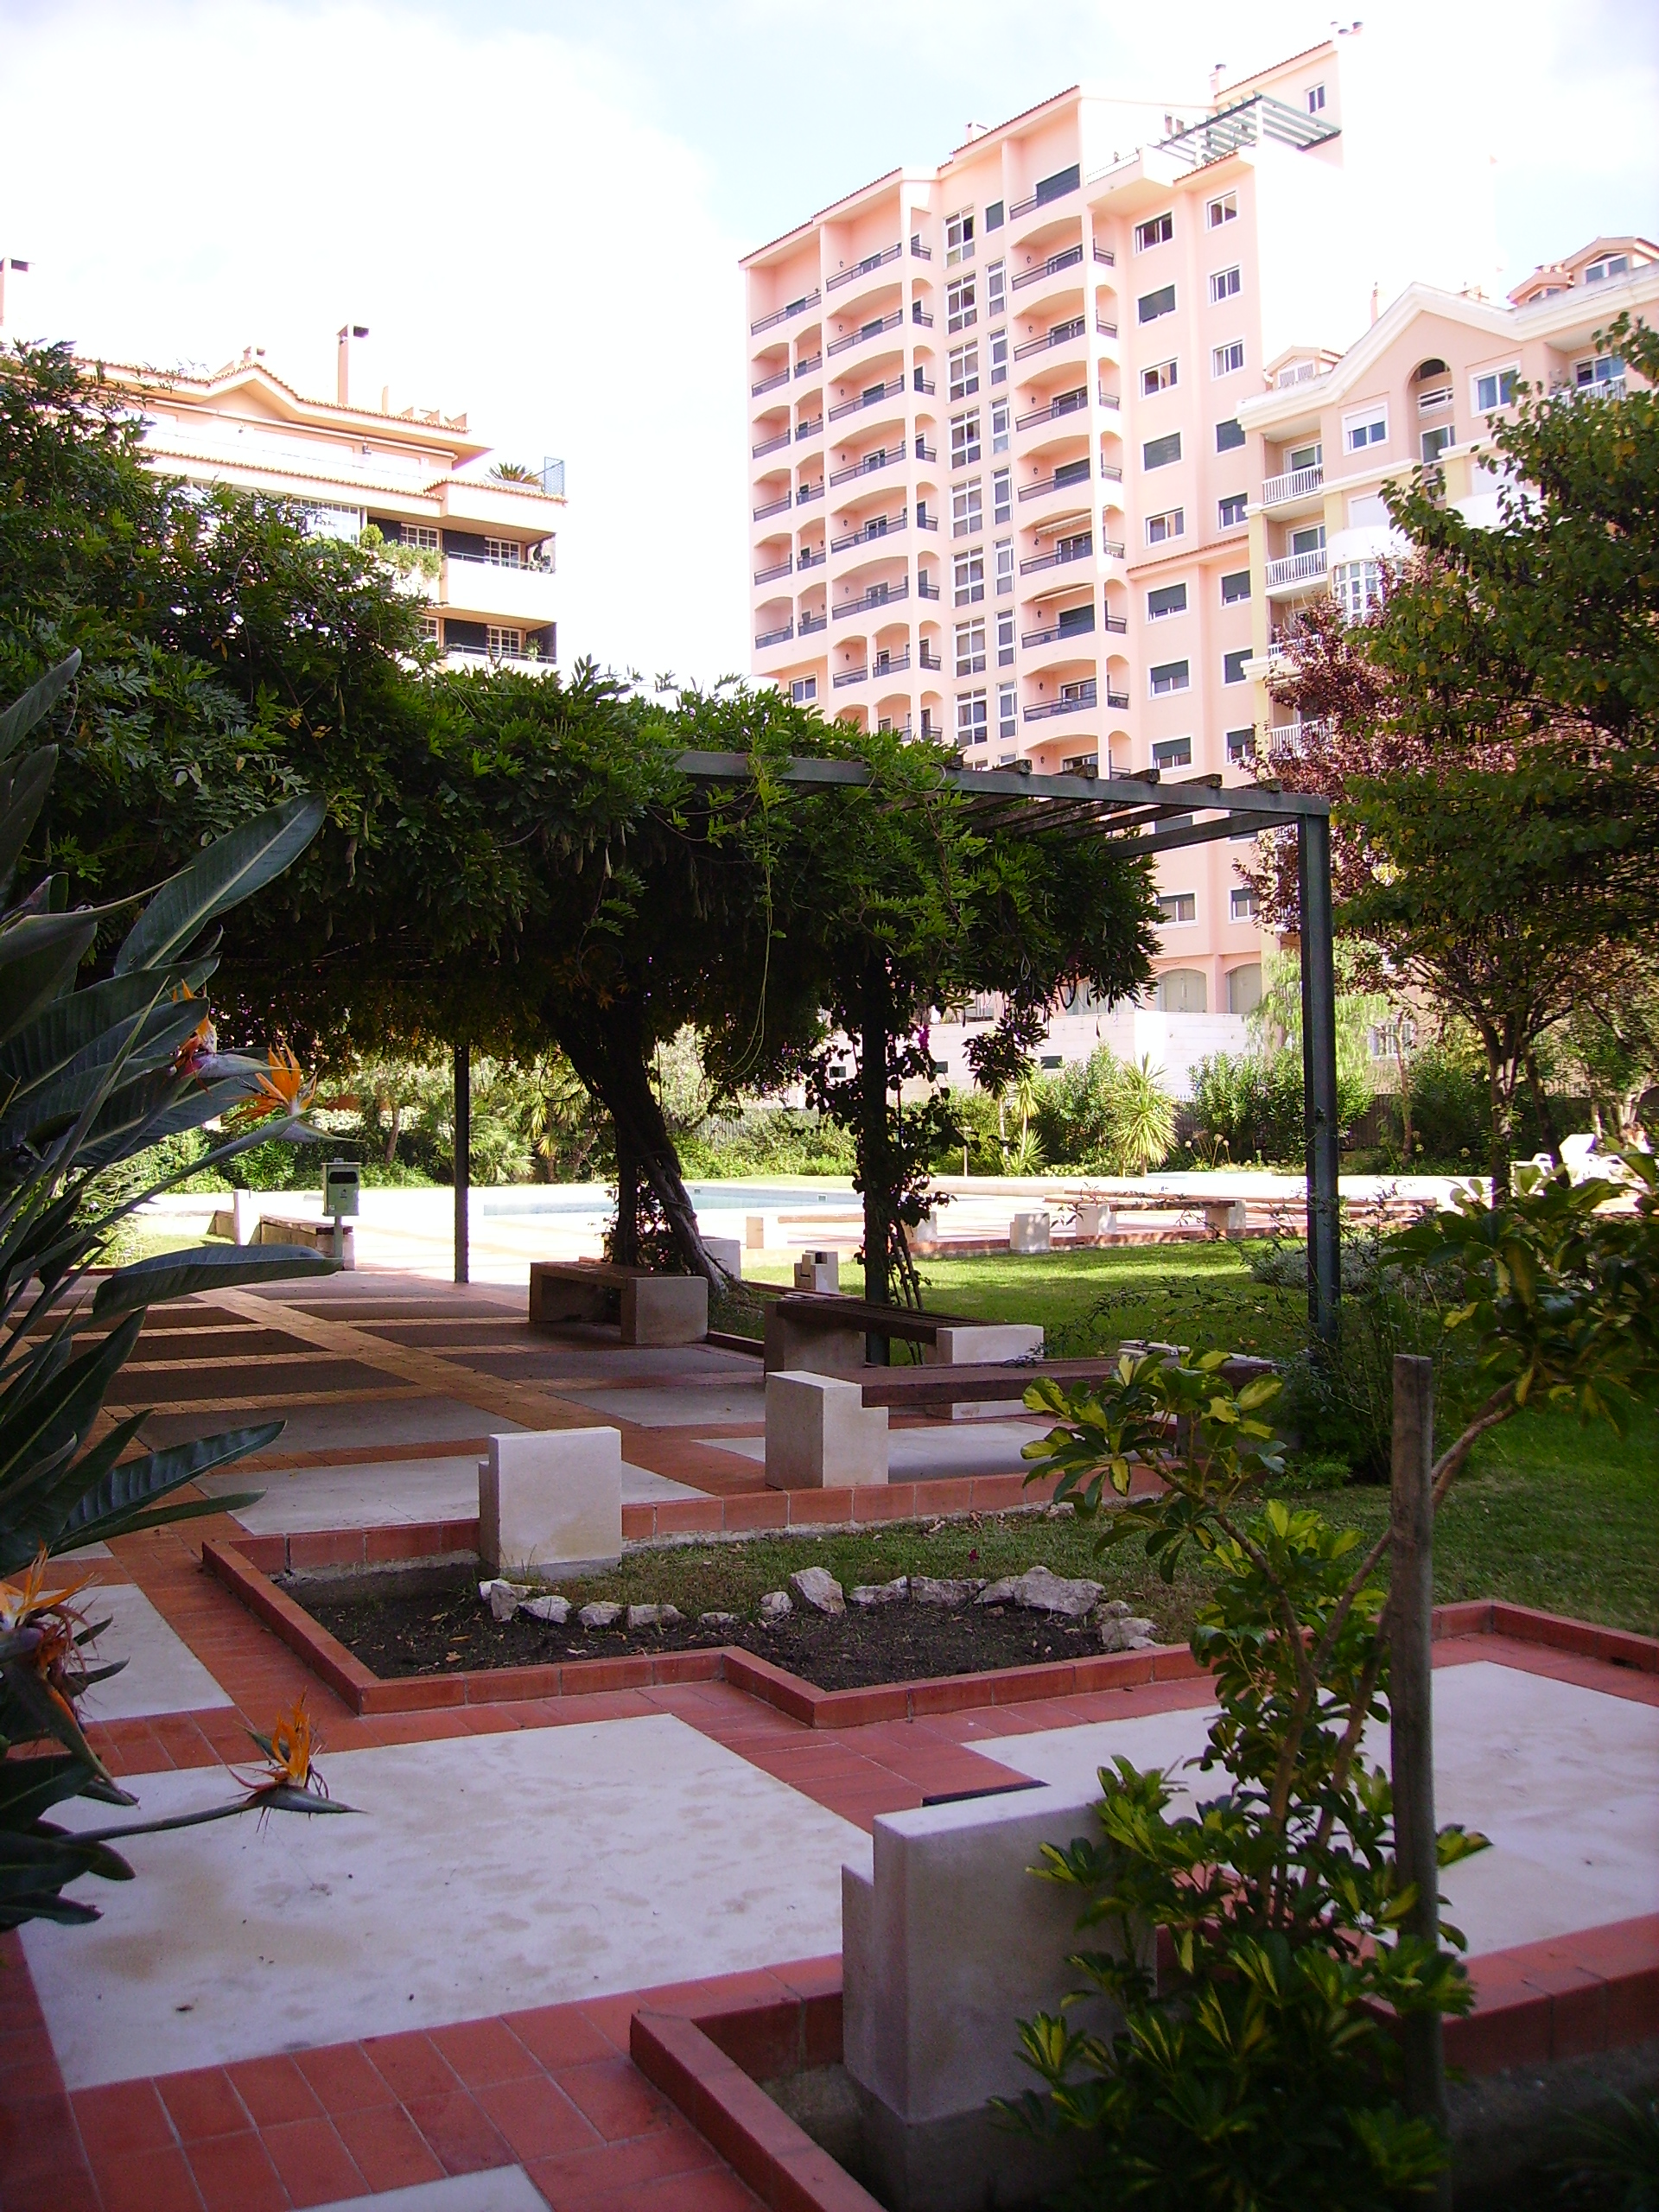 35106/IDWOOB148 Апартаменты Кашкайш-Гуйа (Португалия)